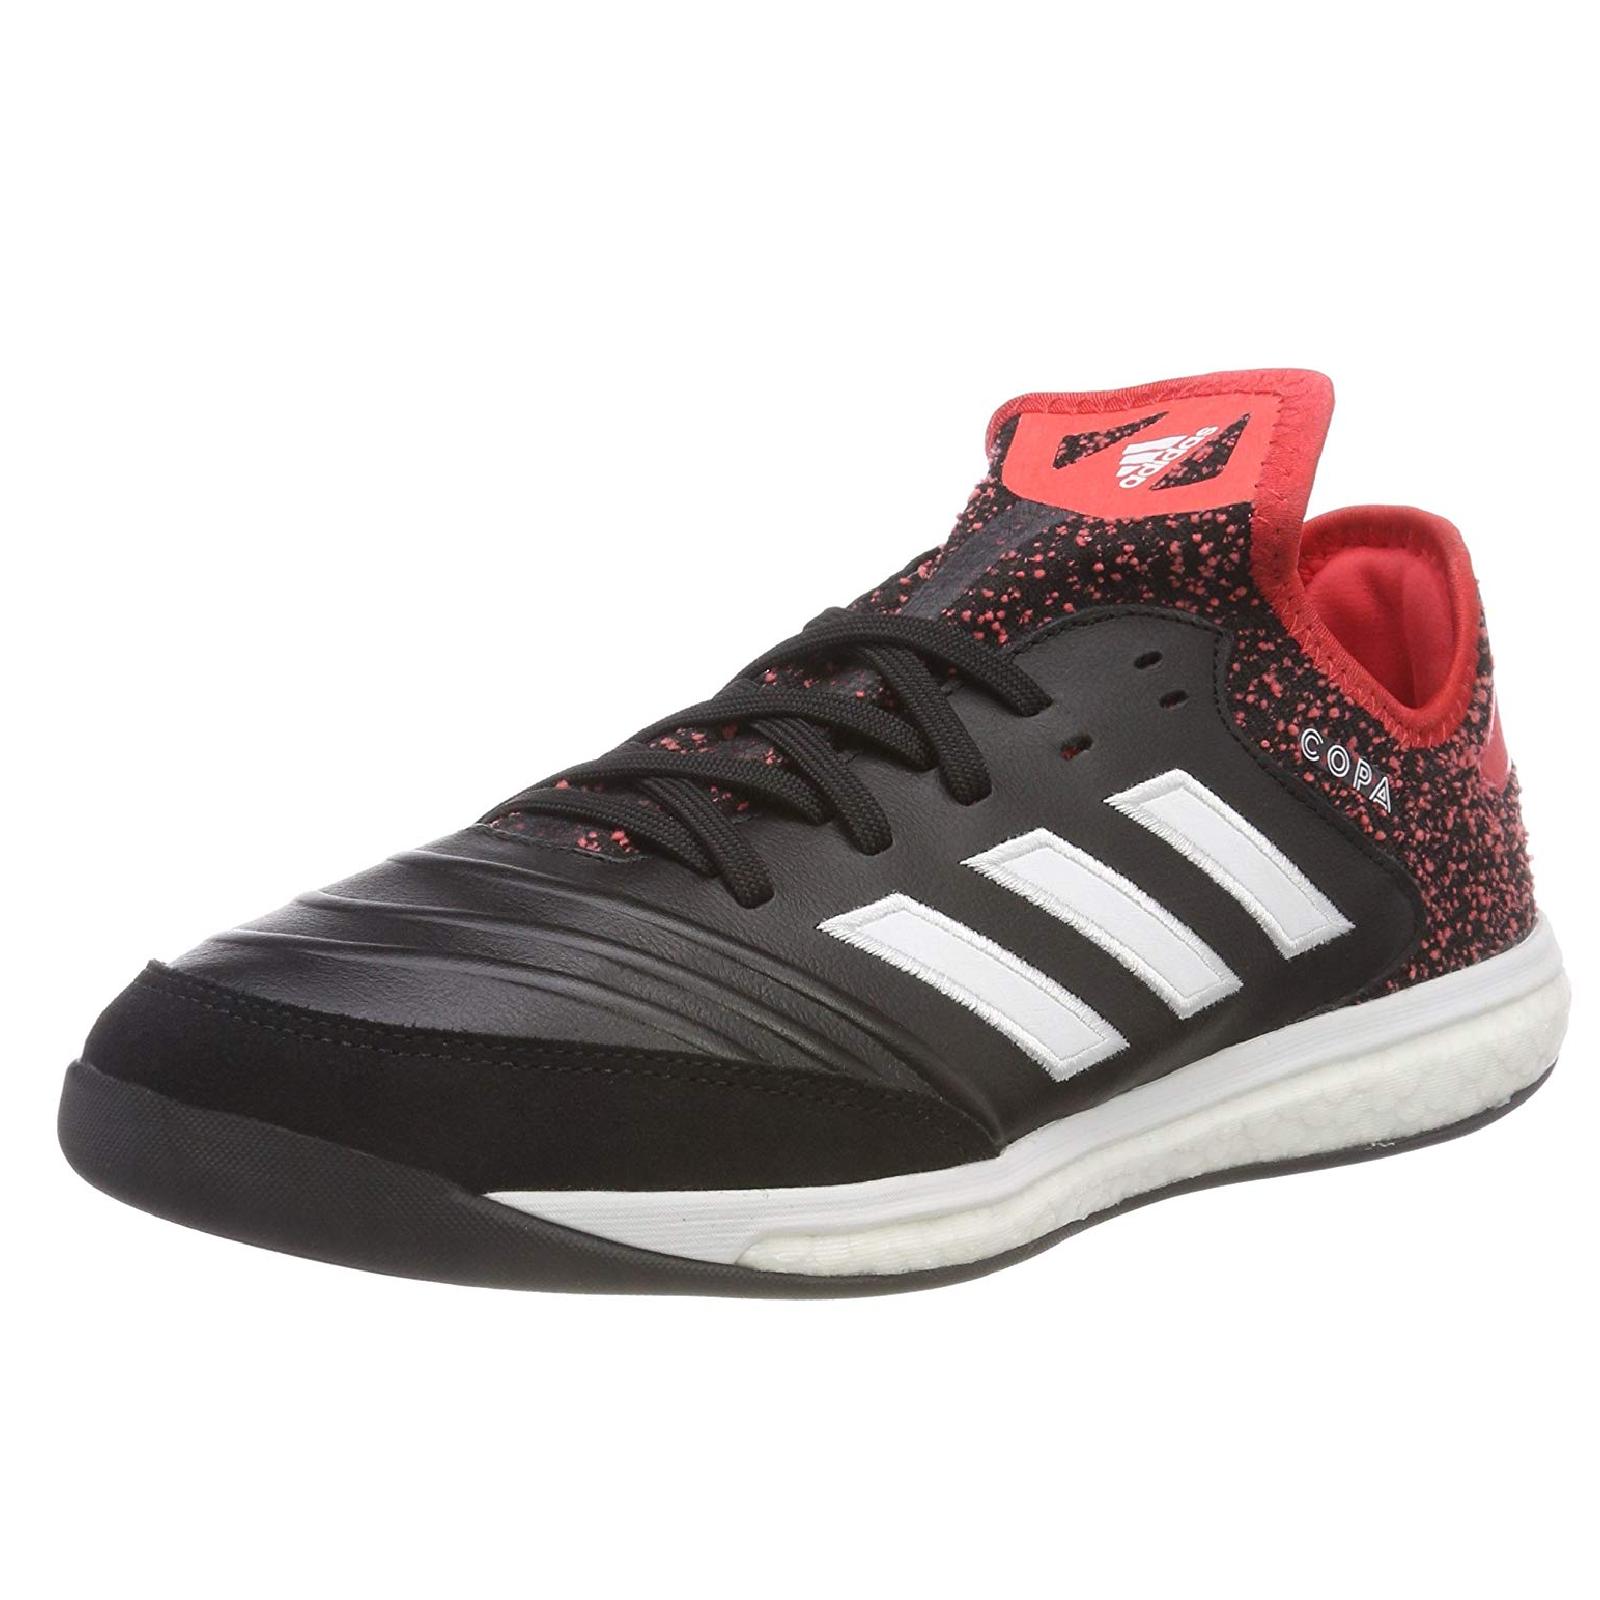 Adidas Copa Tango 18.1 TR Trainer Boost Fussball Turnschuhe Schuhe schwarz CM7668